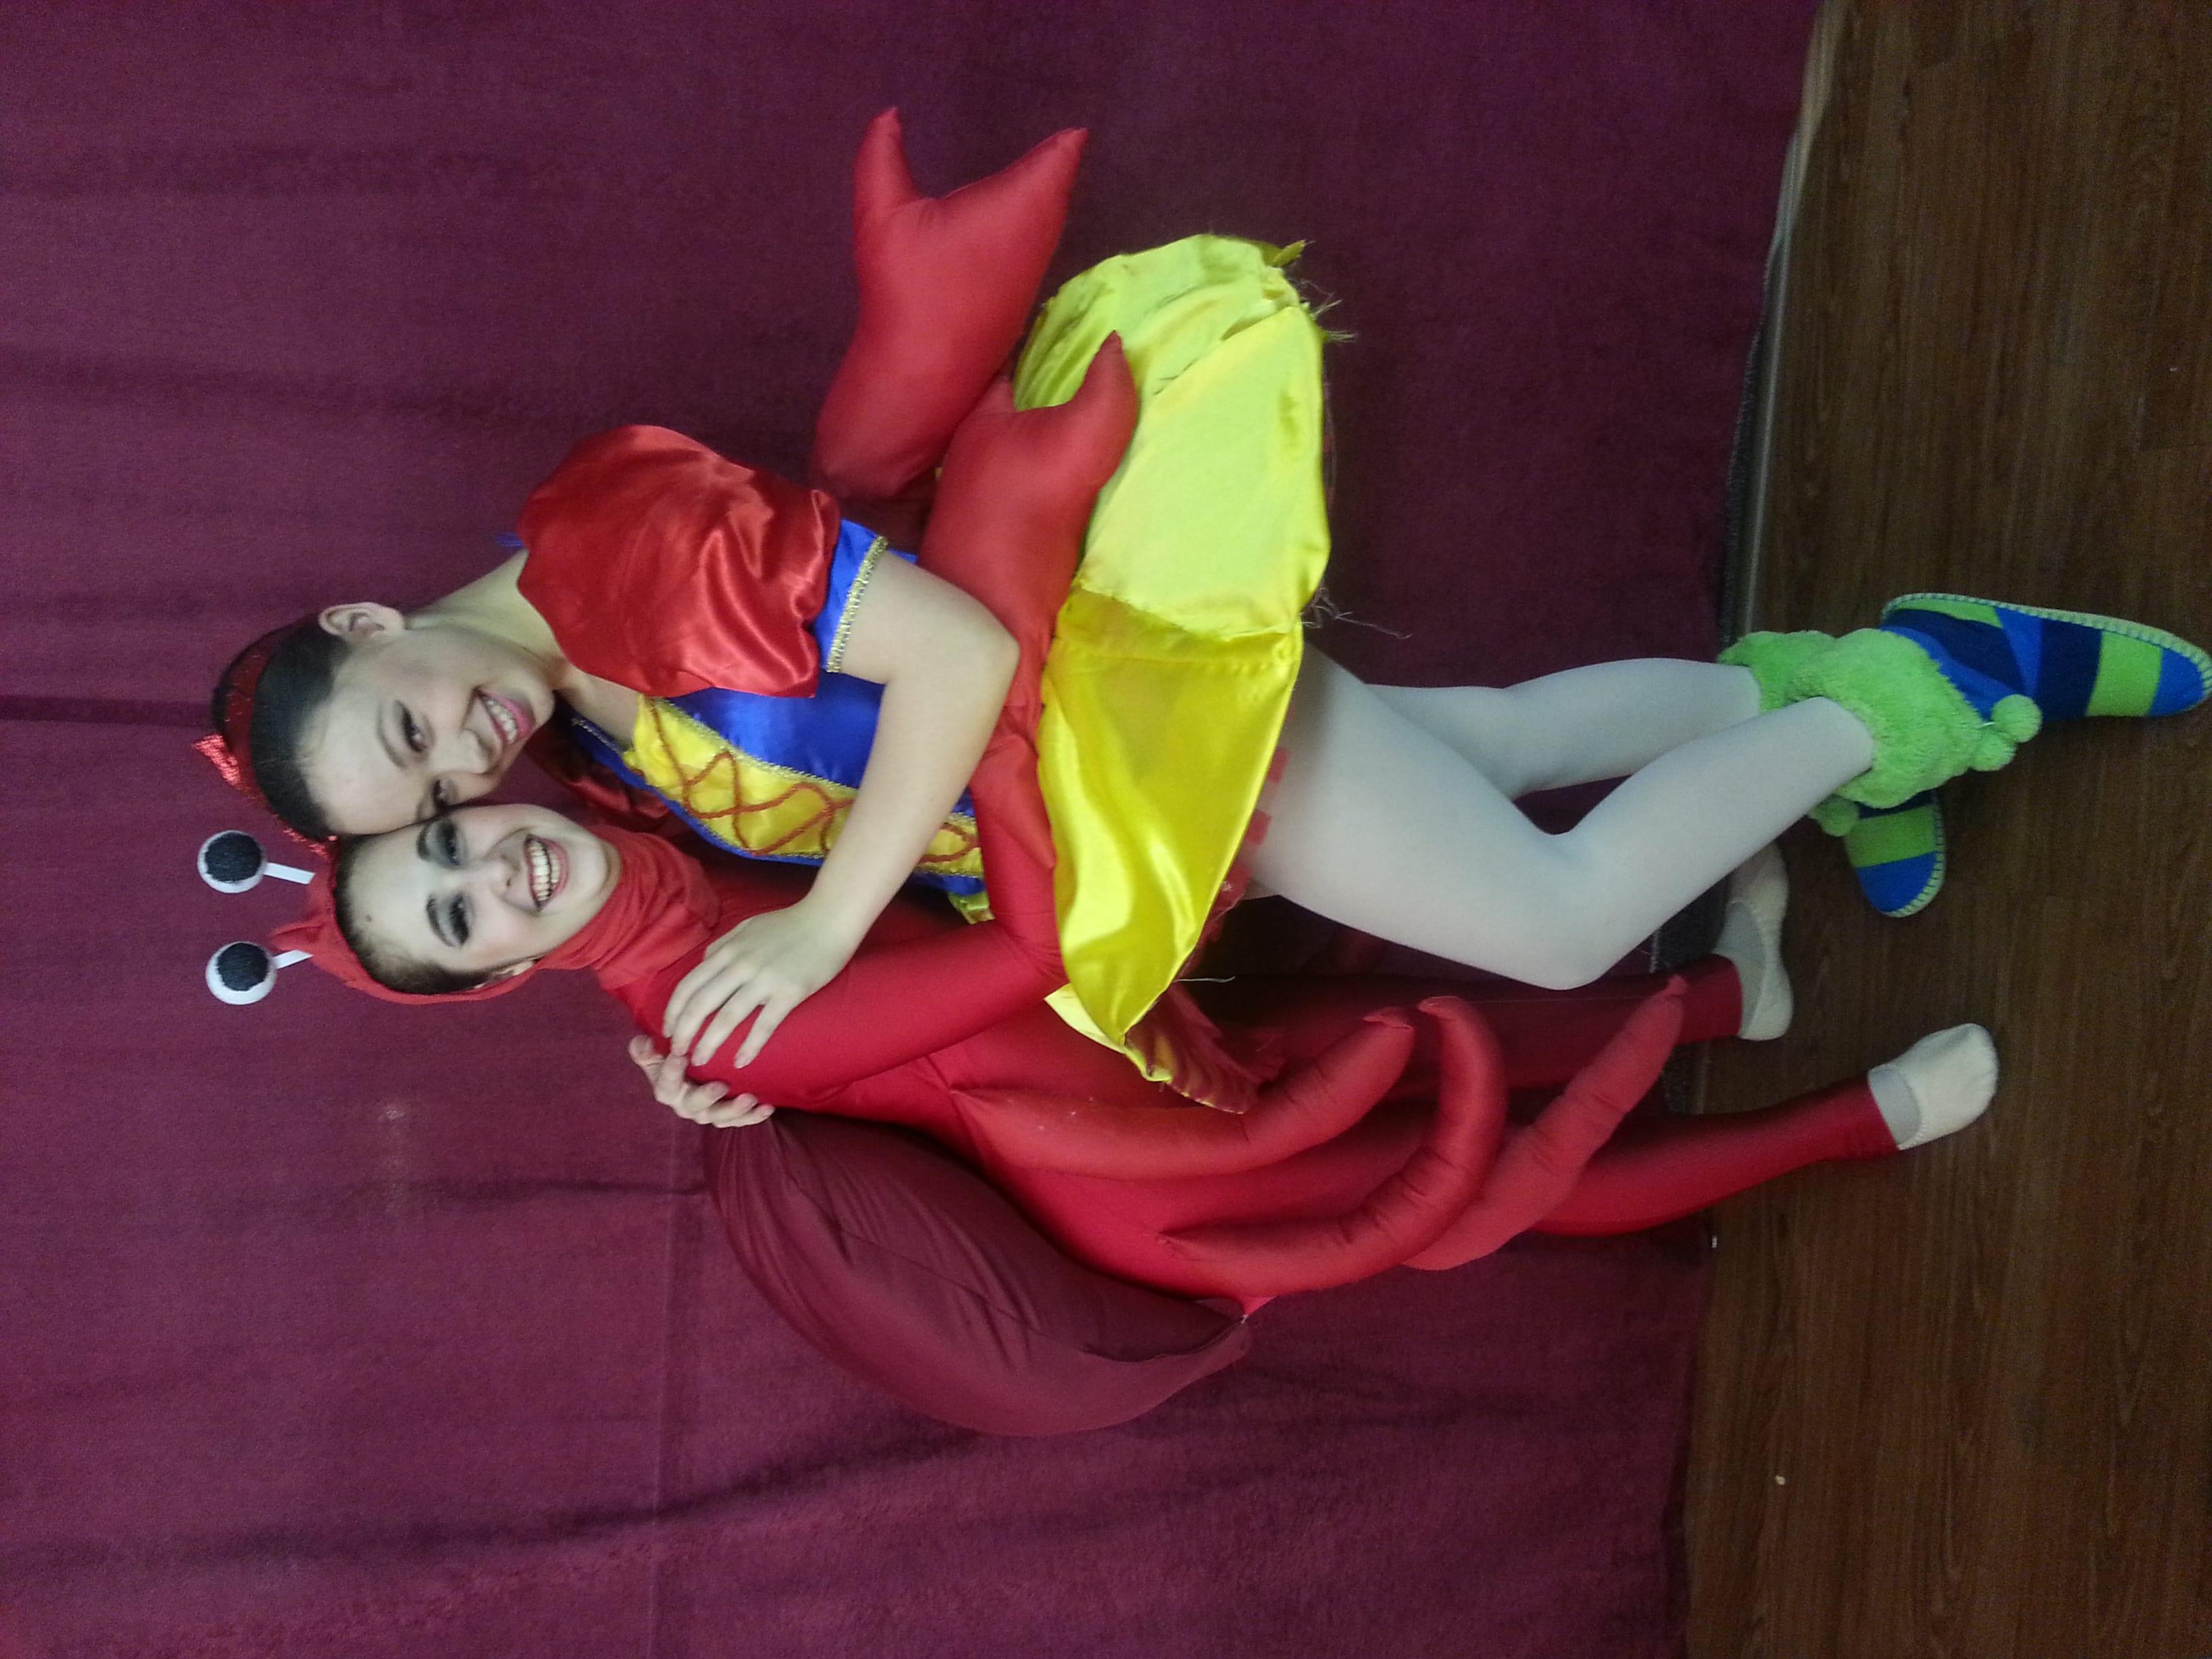 20130317_134655 – Beth Fowler School of Dance : Genoa and St. Charles Illinois